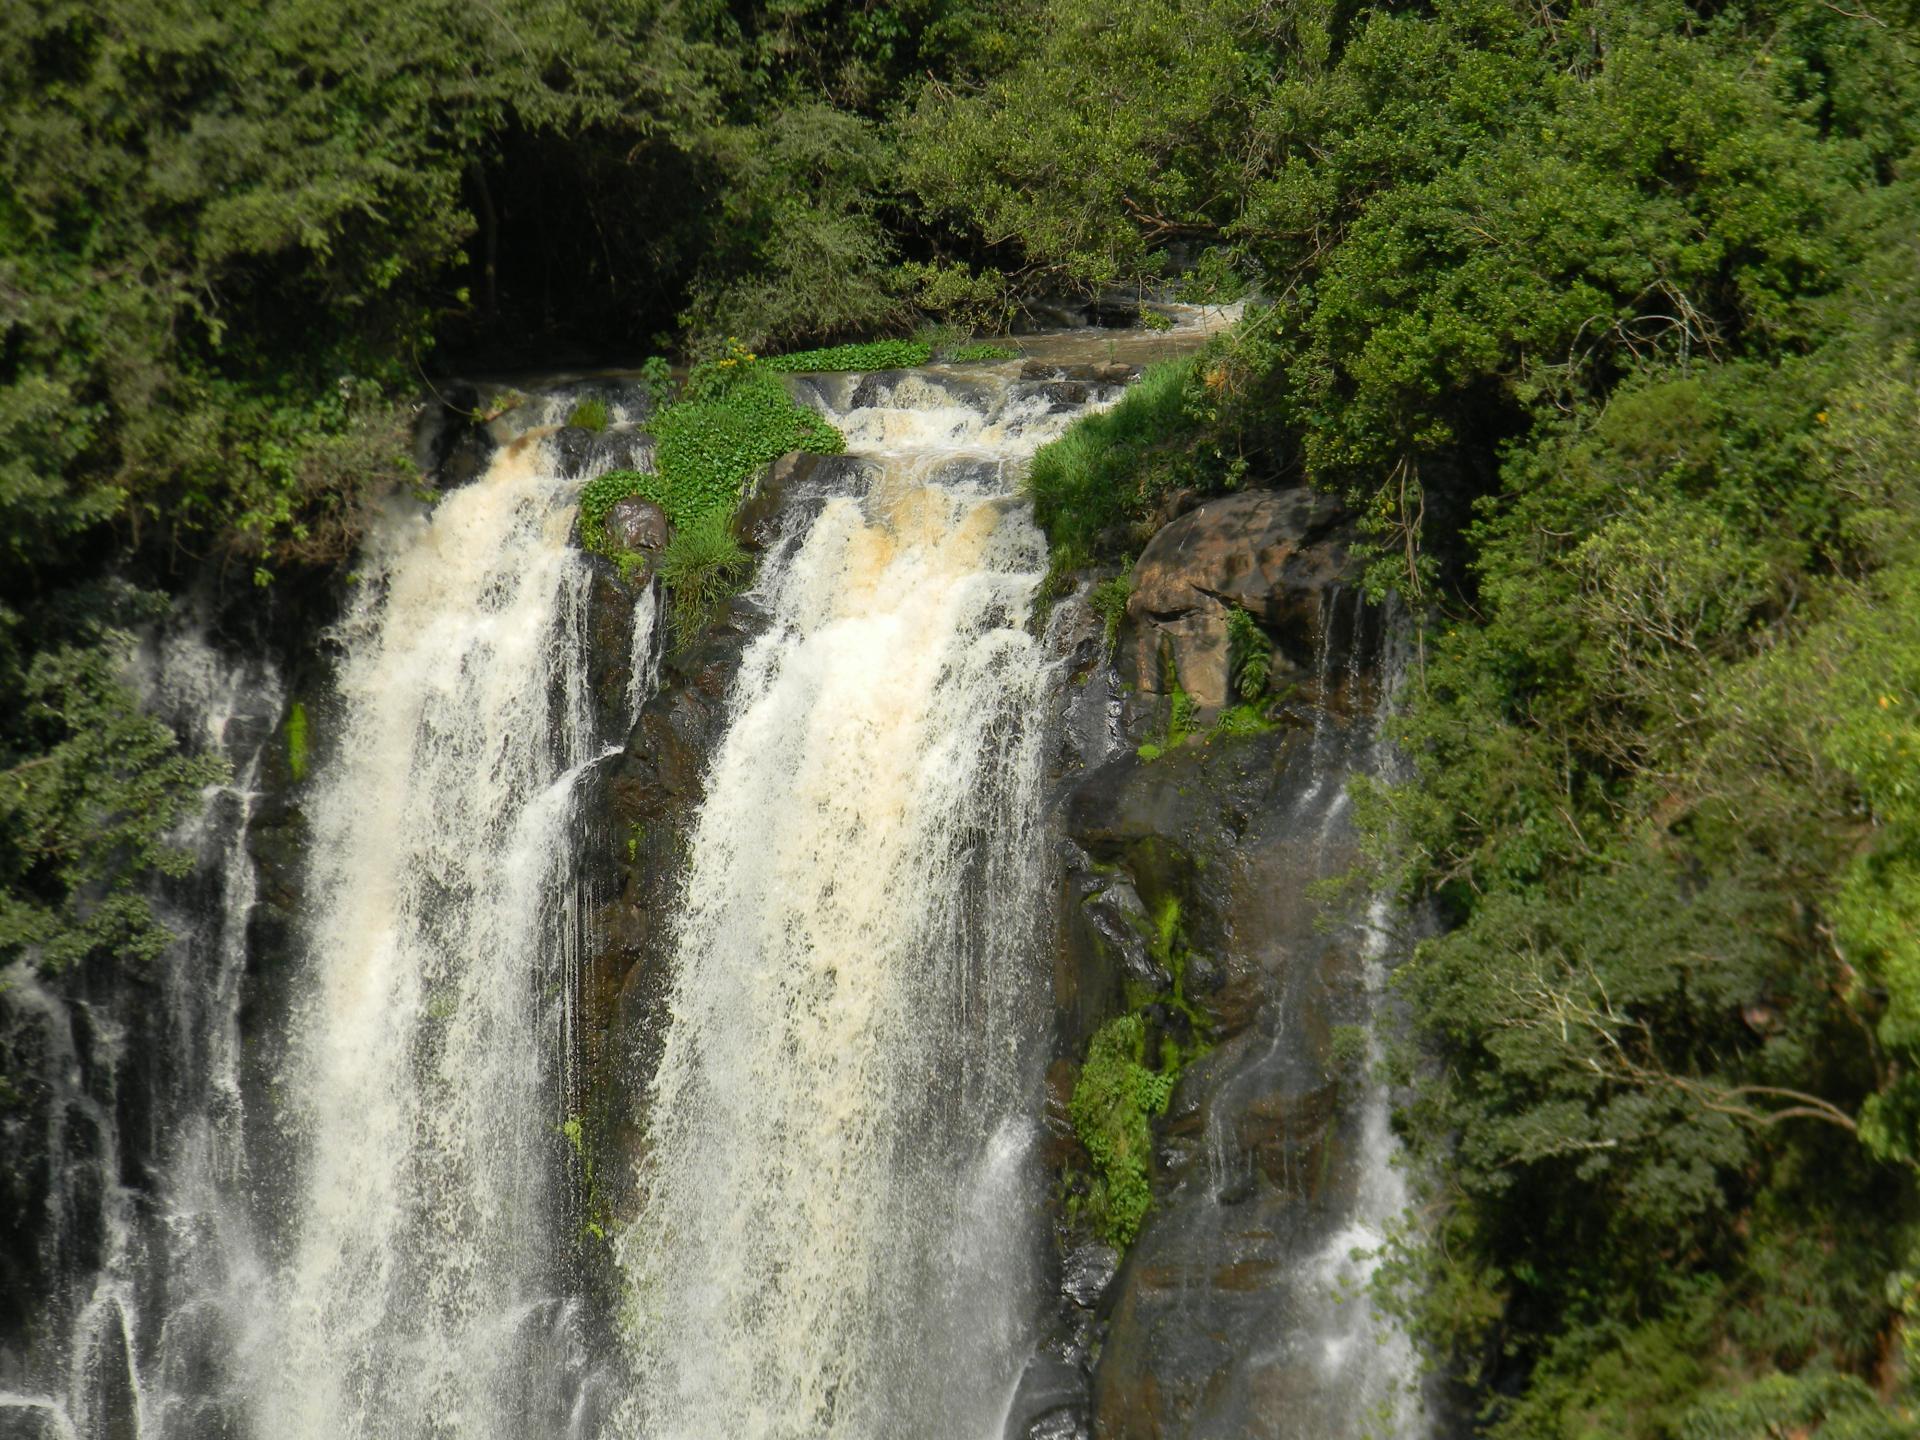 Thompson Falls Nyahururu / Kenya Adventure tours safaris